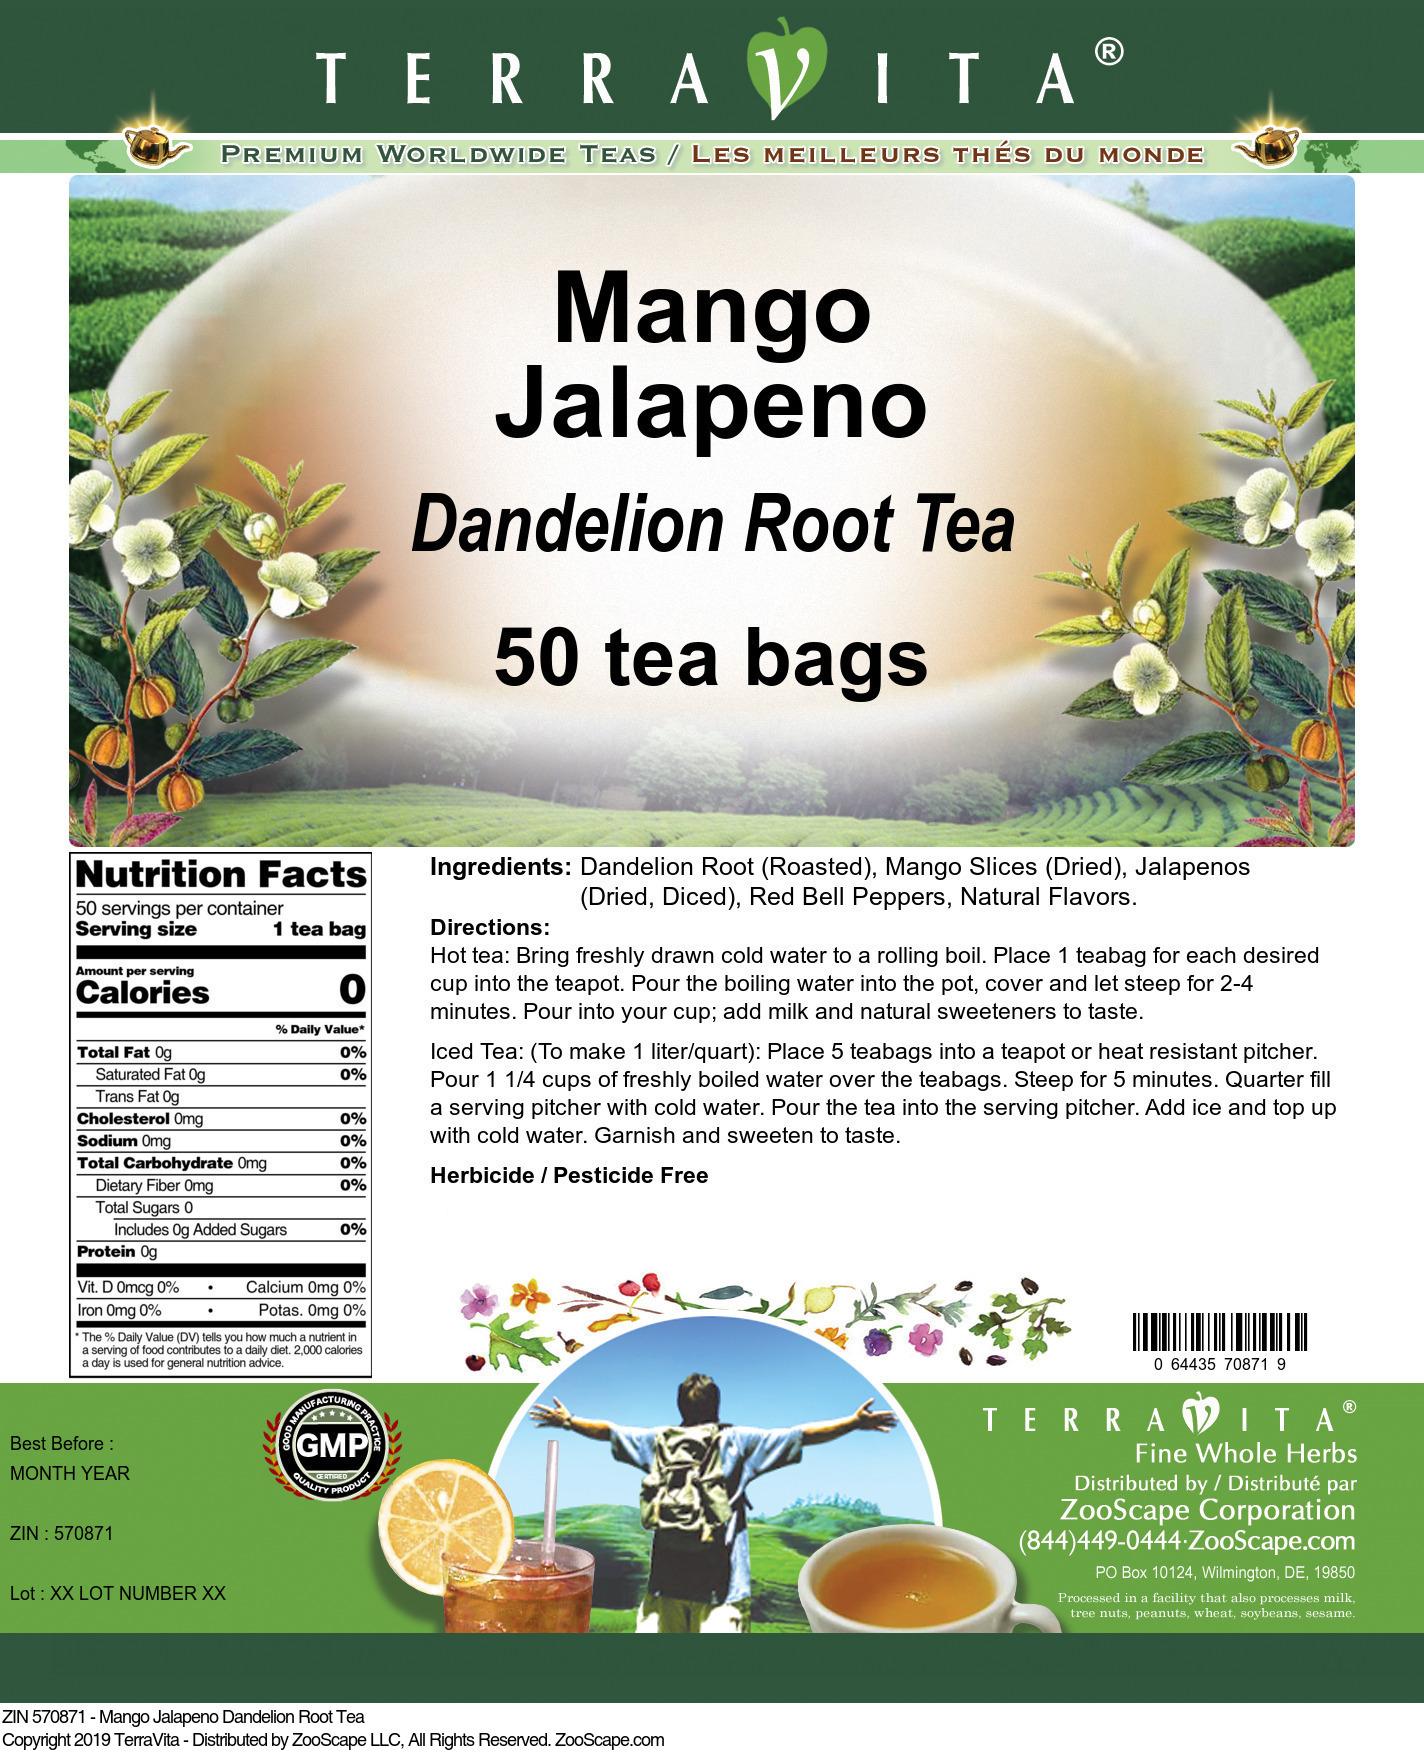 Mango Jalapeno Dandelion Root